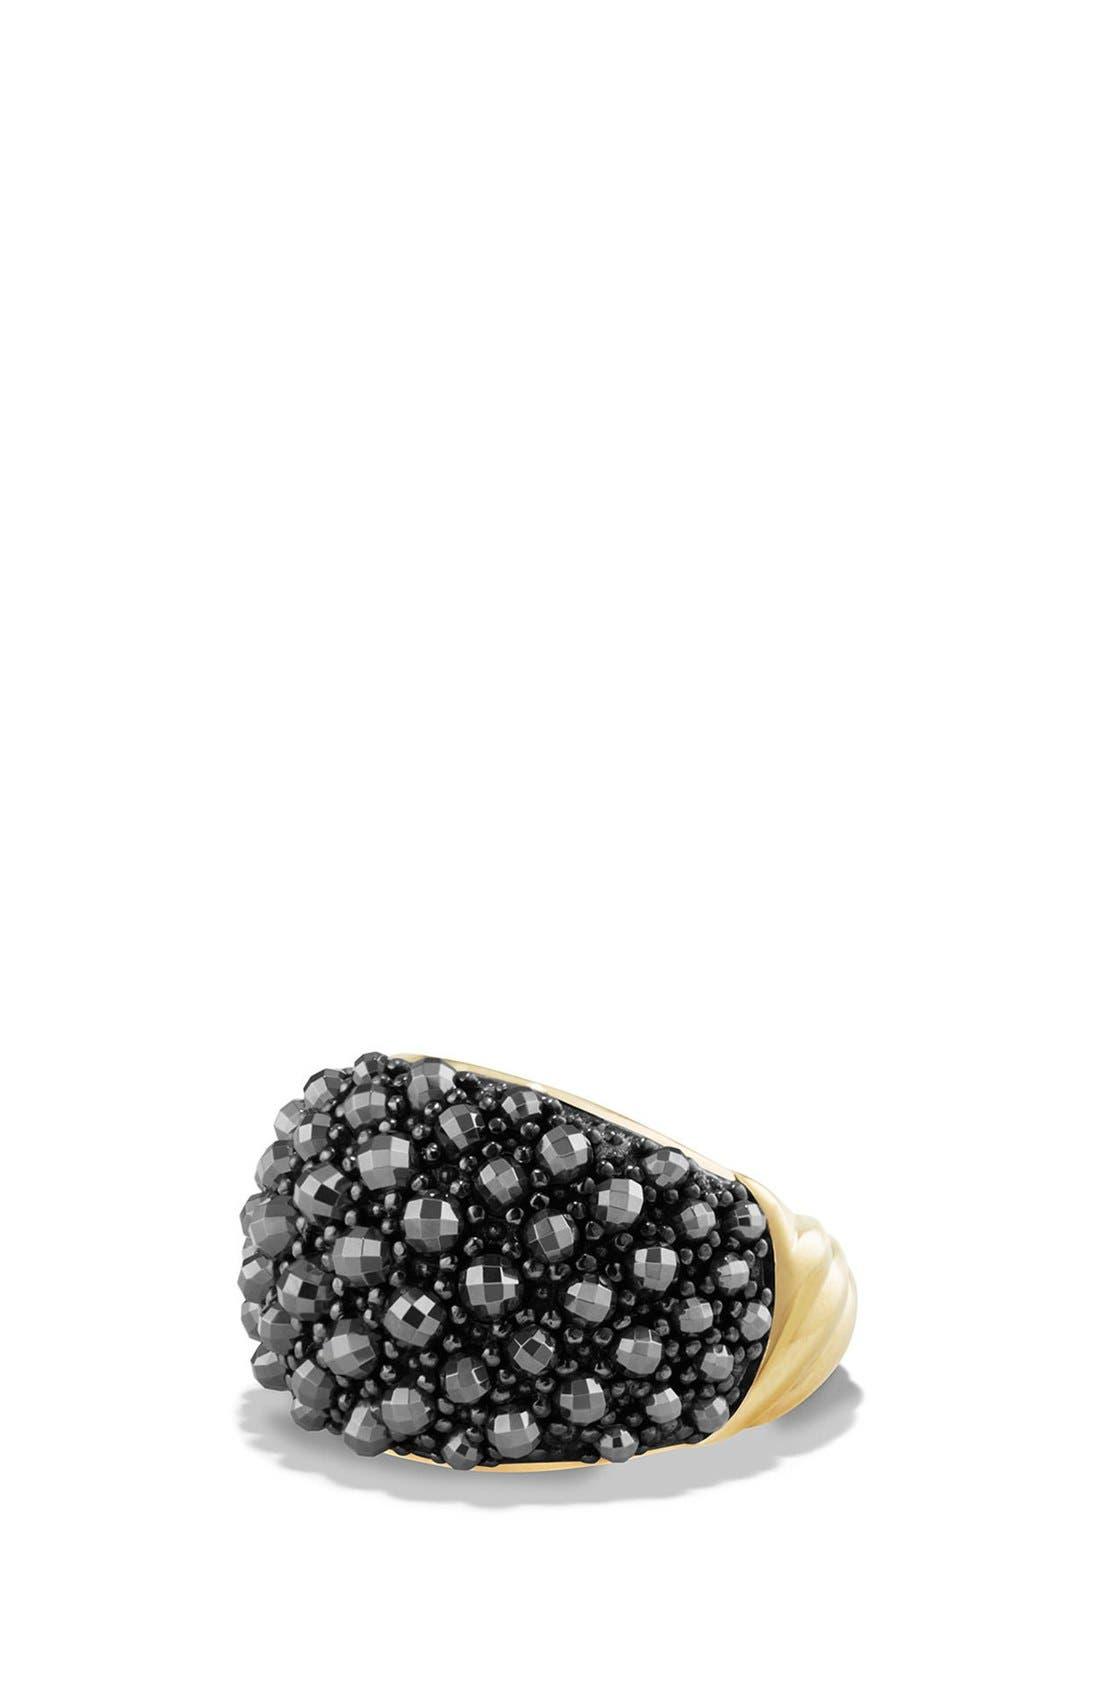 David Yurman Osetra Dome Ring with 18K Gold